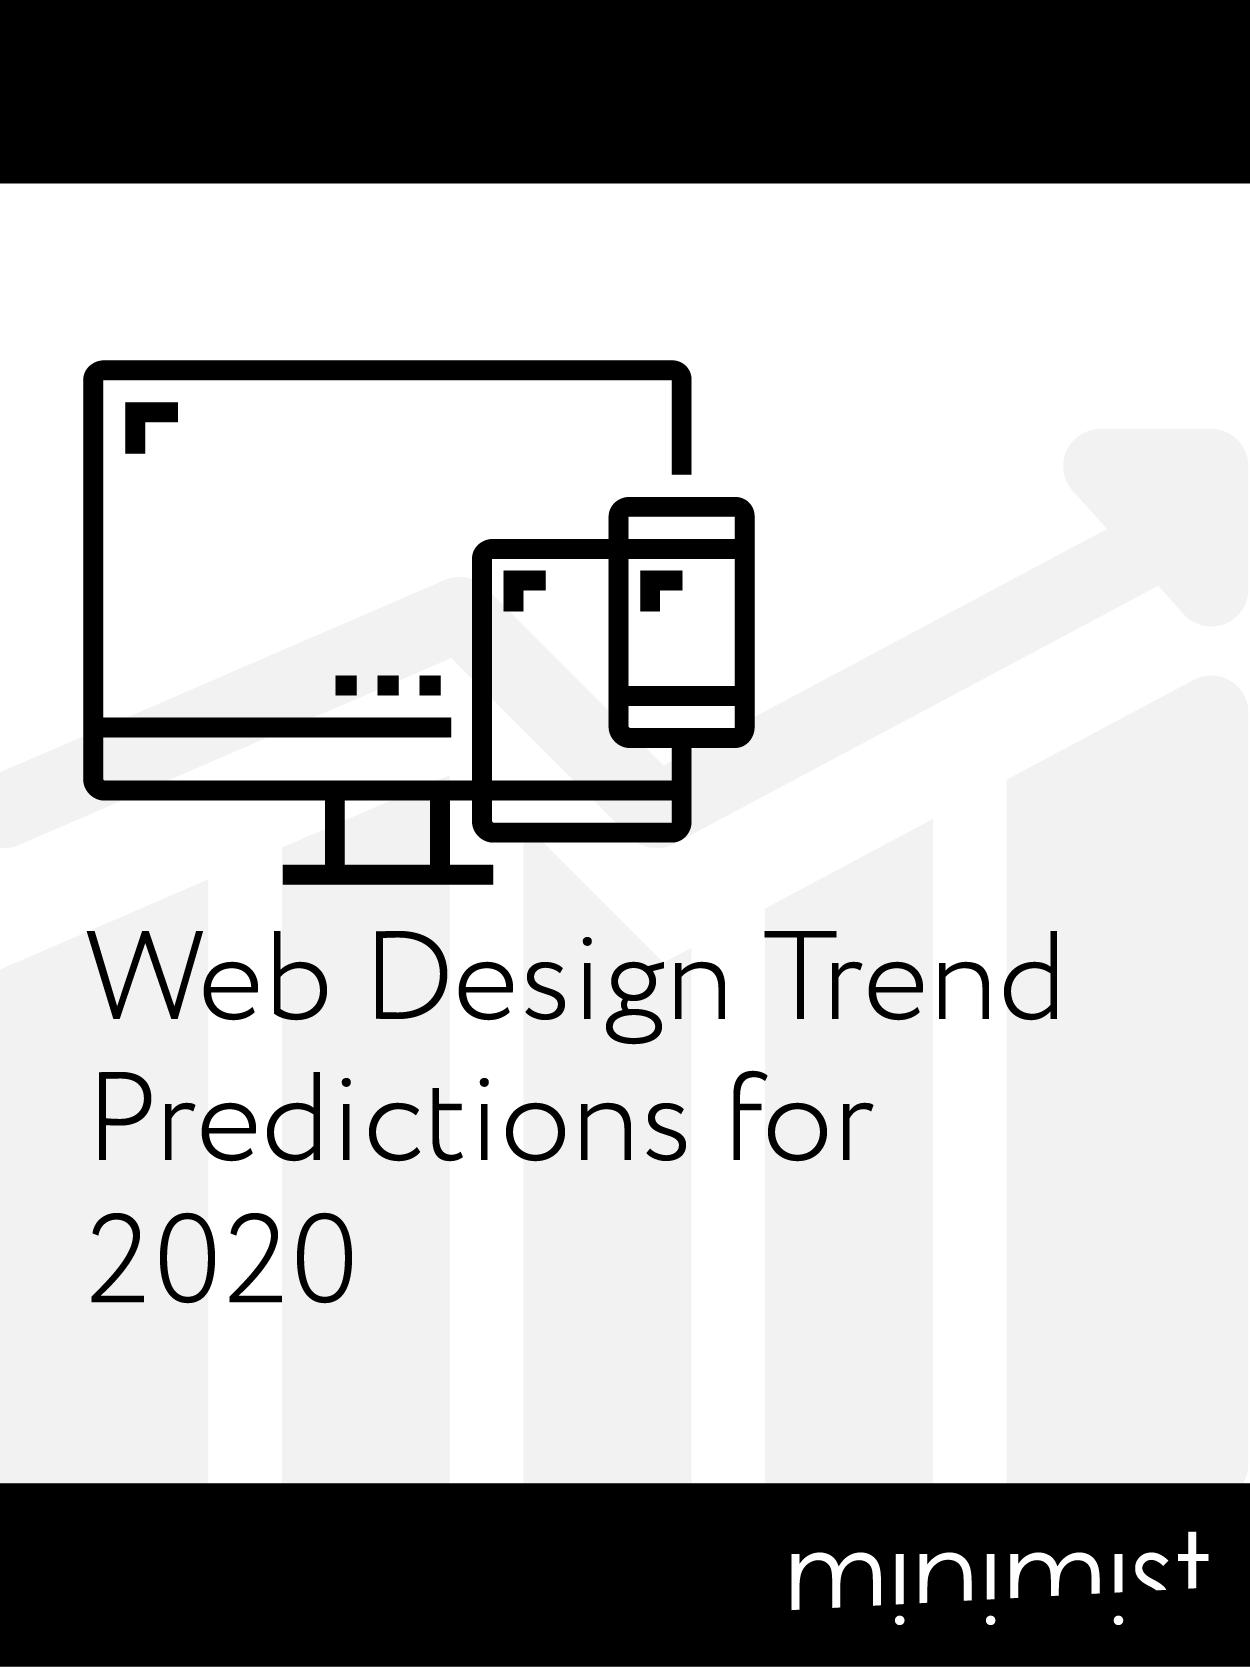 Web Design Trend Predictions for 2020 — Minimist Design